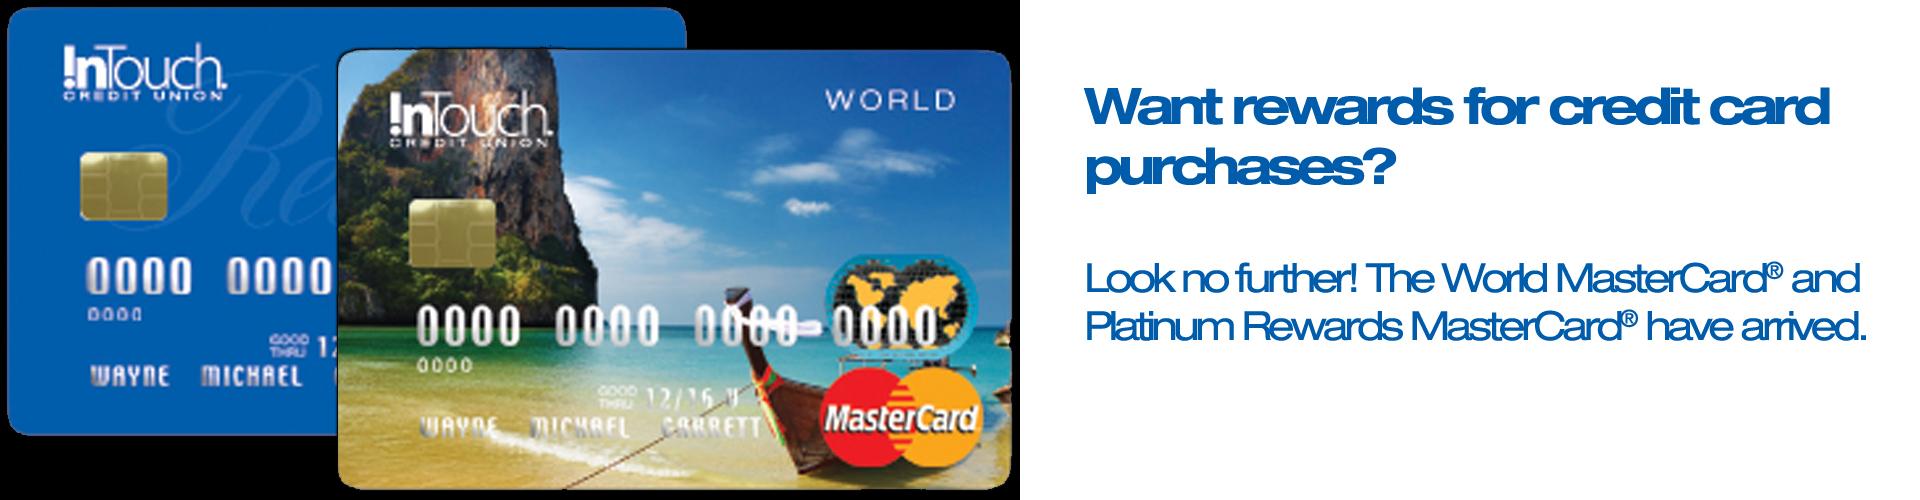 Ksvtn6ivr7kqck50vigm+creditcardsintro_webbanner